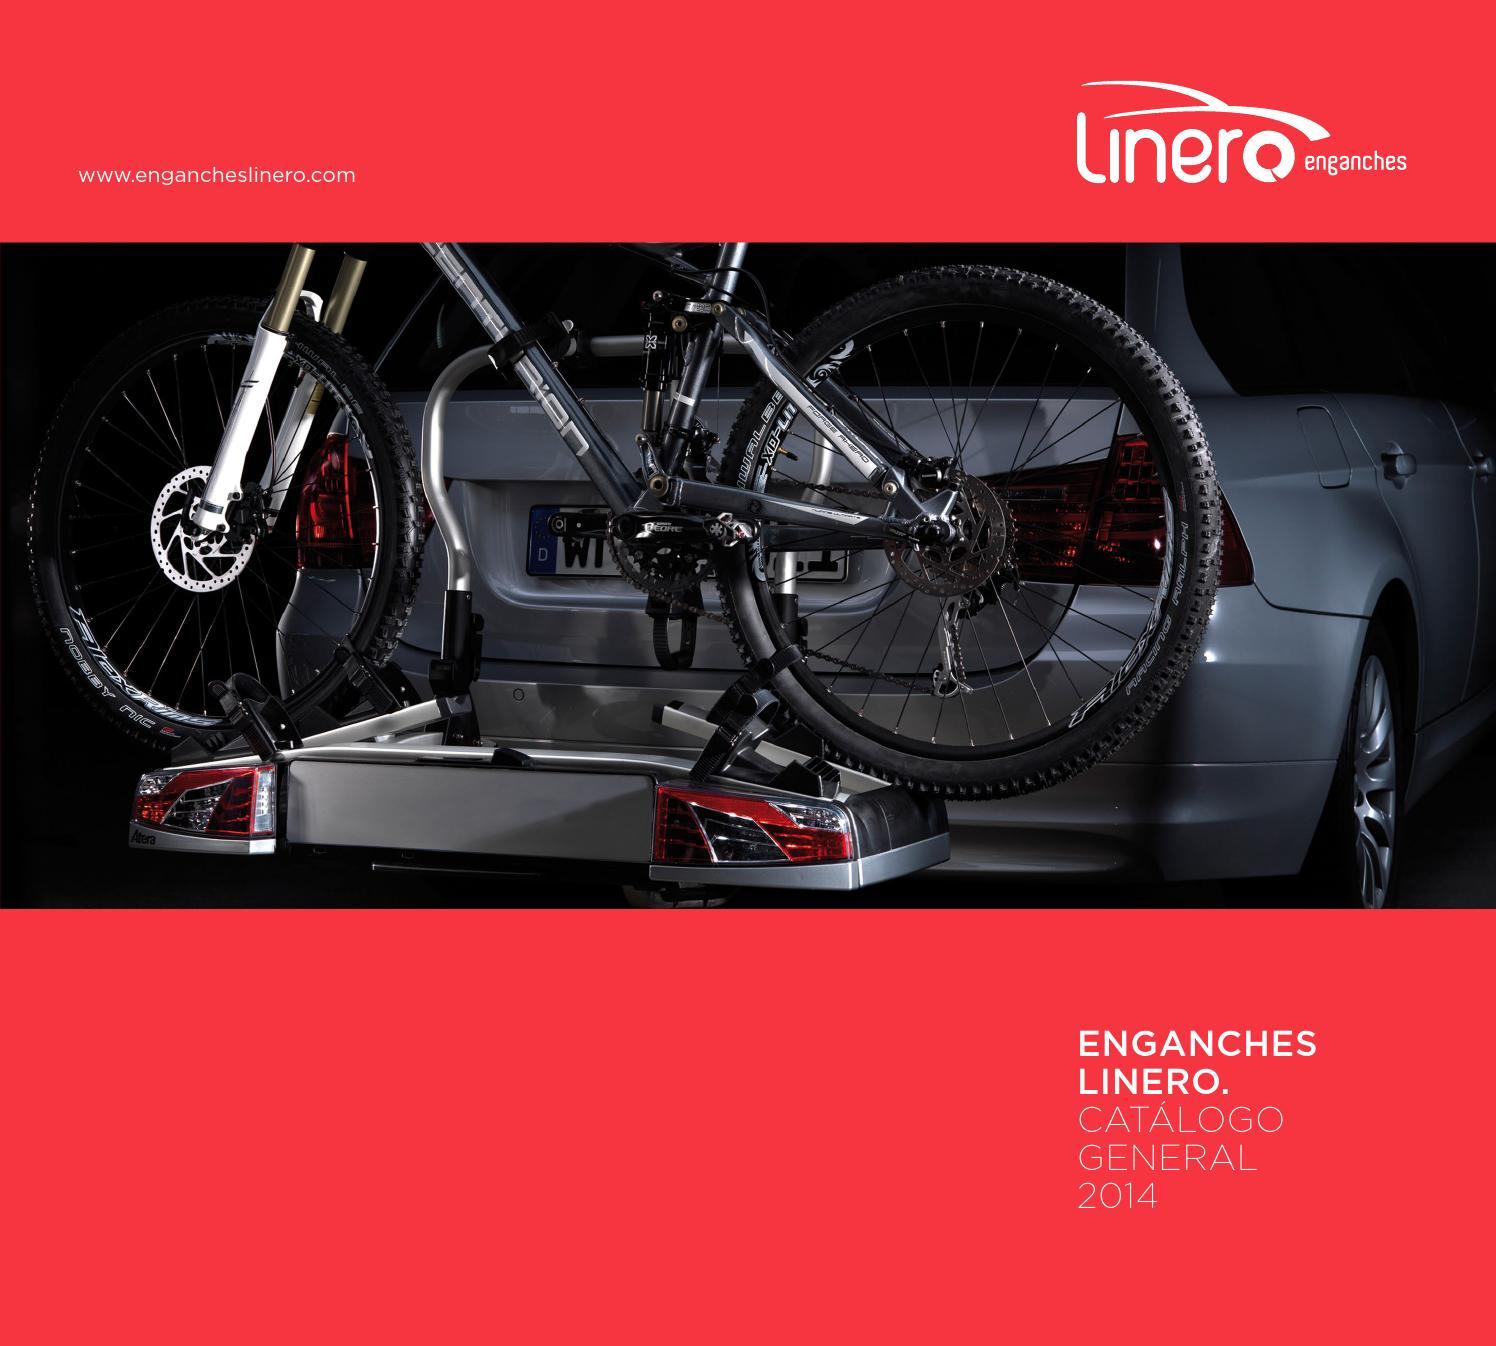 Witter Gancho De Remolque Para Honda fr-v 2004-2010 Desmontable barra de remolque